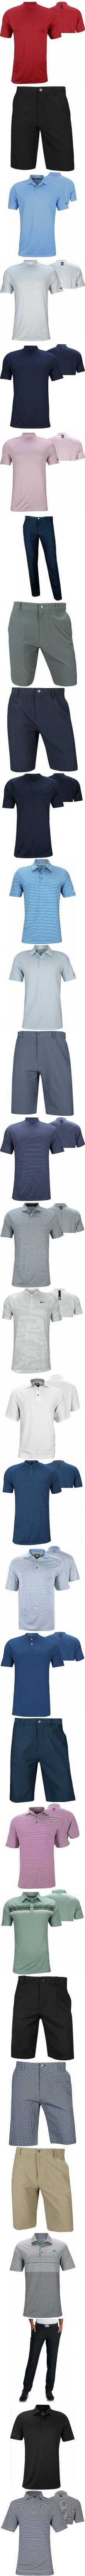 803cacb2 Golf shoes, golf apparel, rainwear, shirts, gloves, balls and more â ...